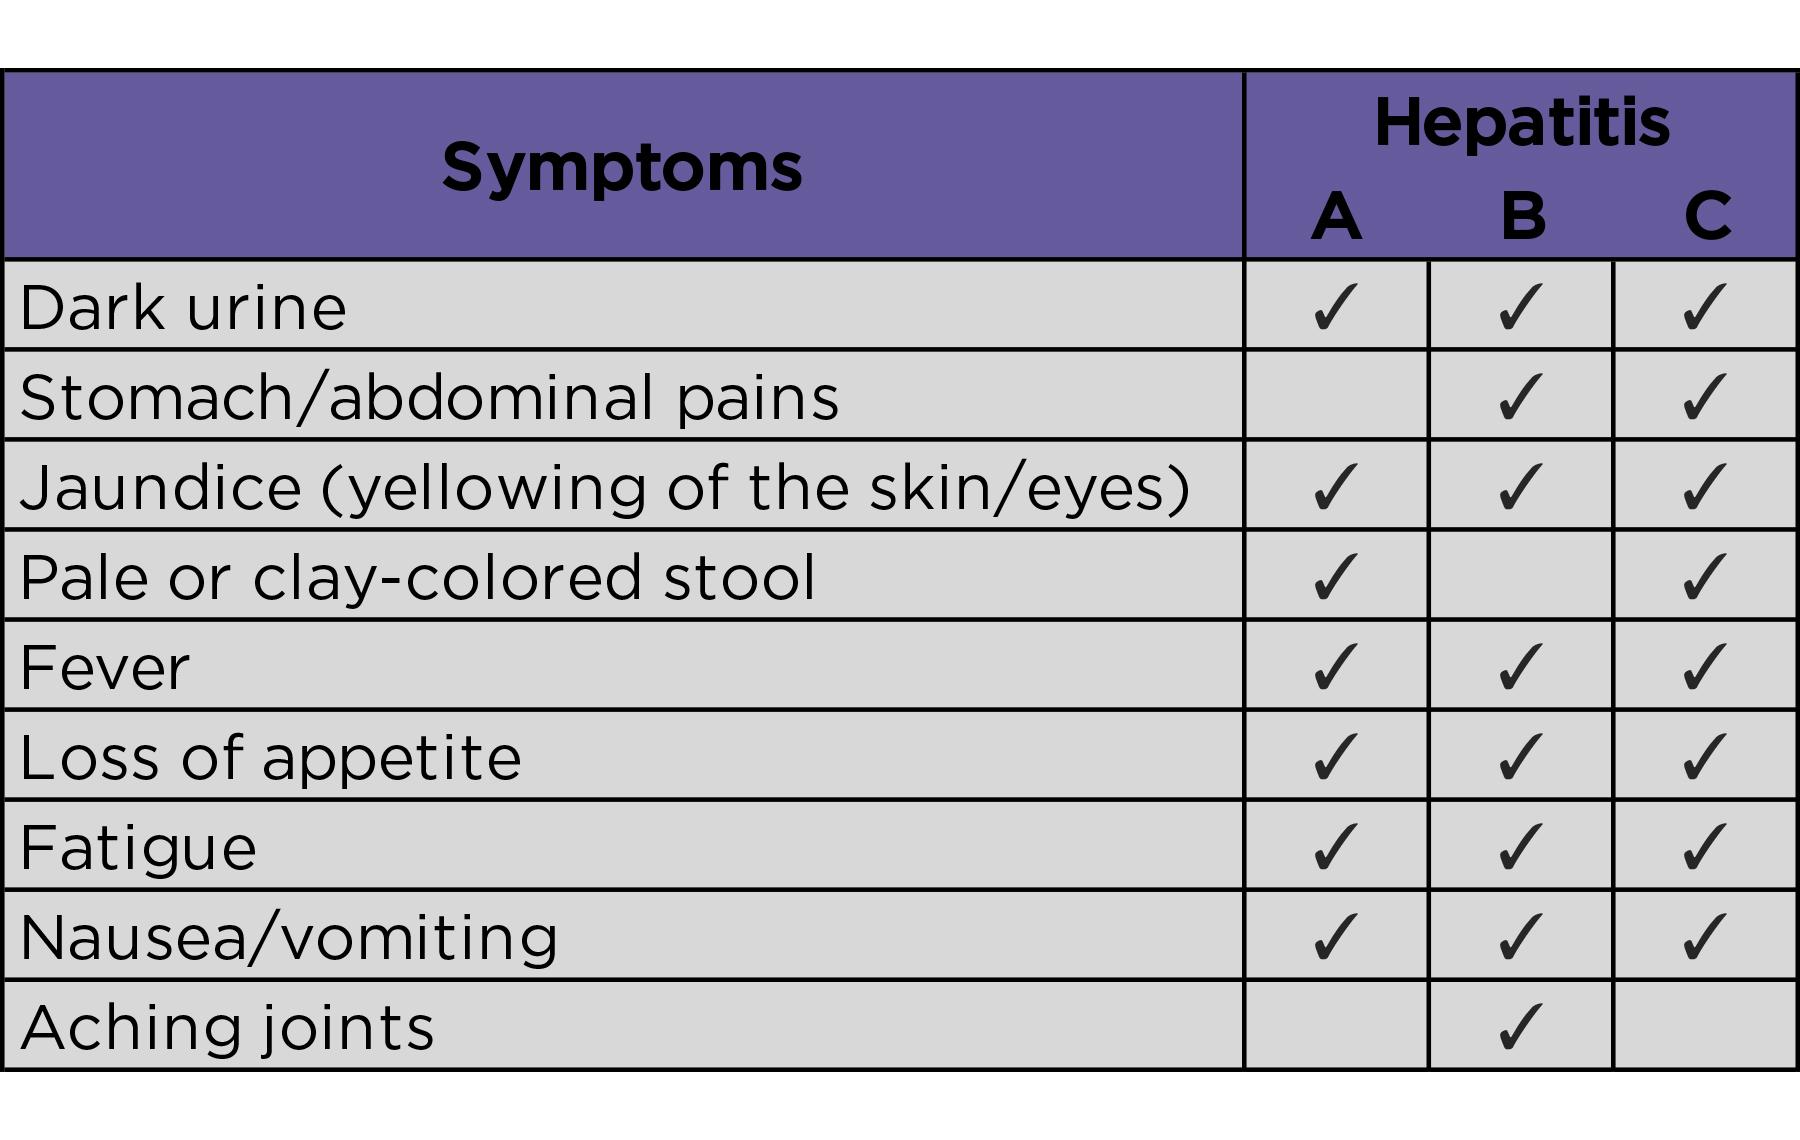 Table with hepatitis symptoms